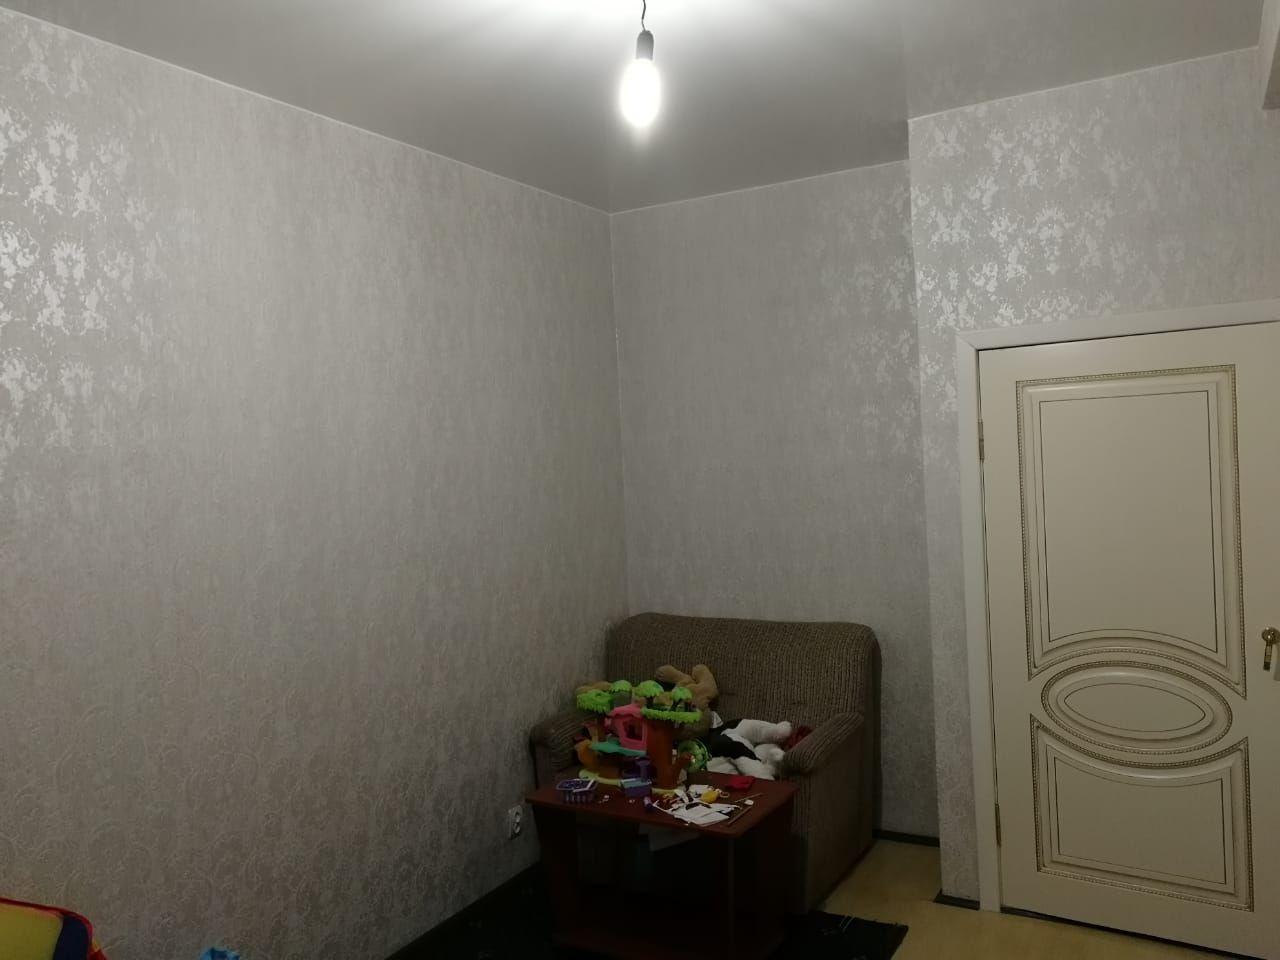 Трехкомнатная квартира - ул. Народная, д. 15